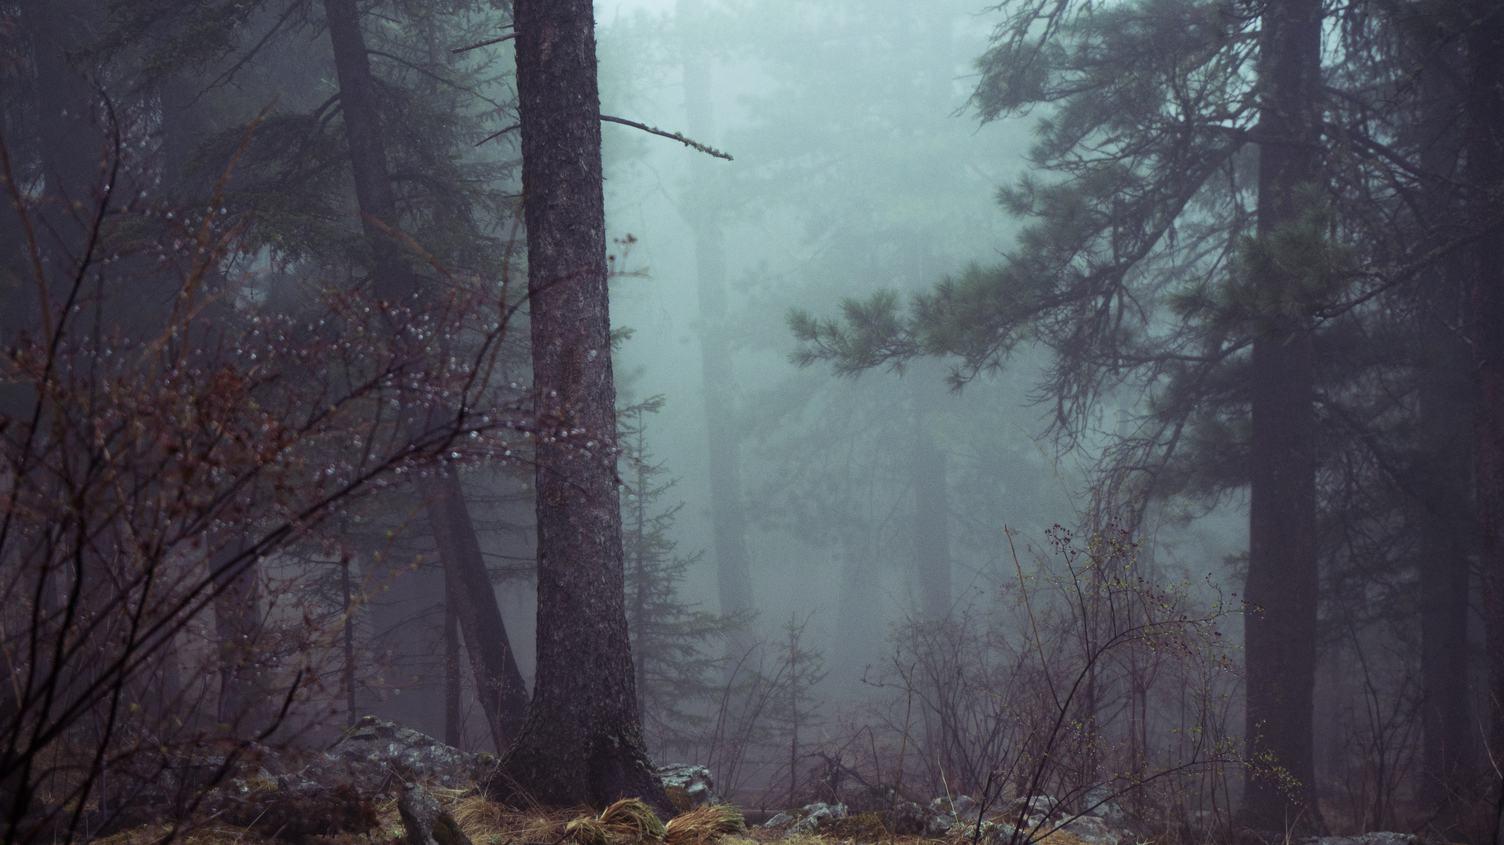 Dark Foggy Forest